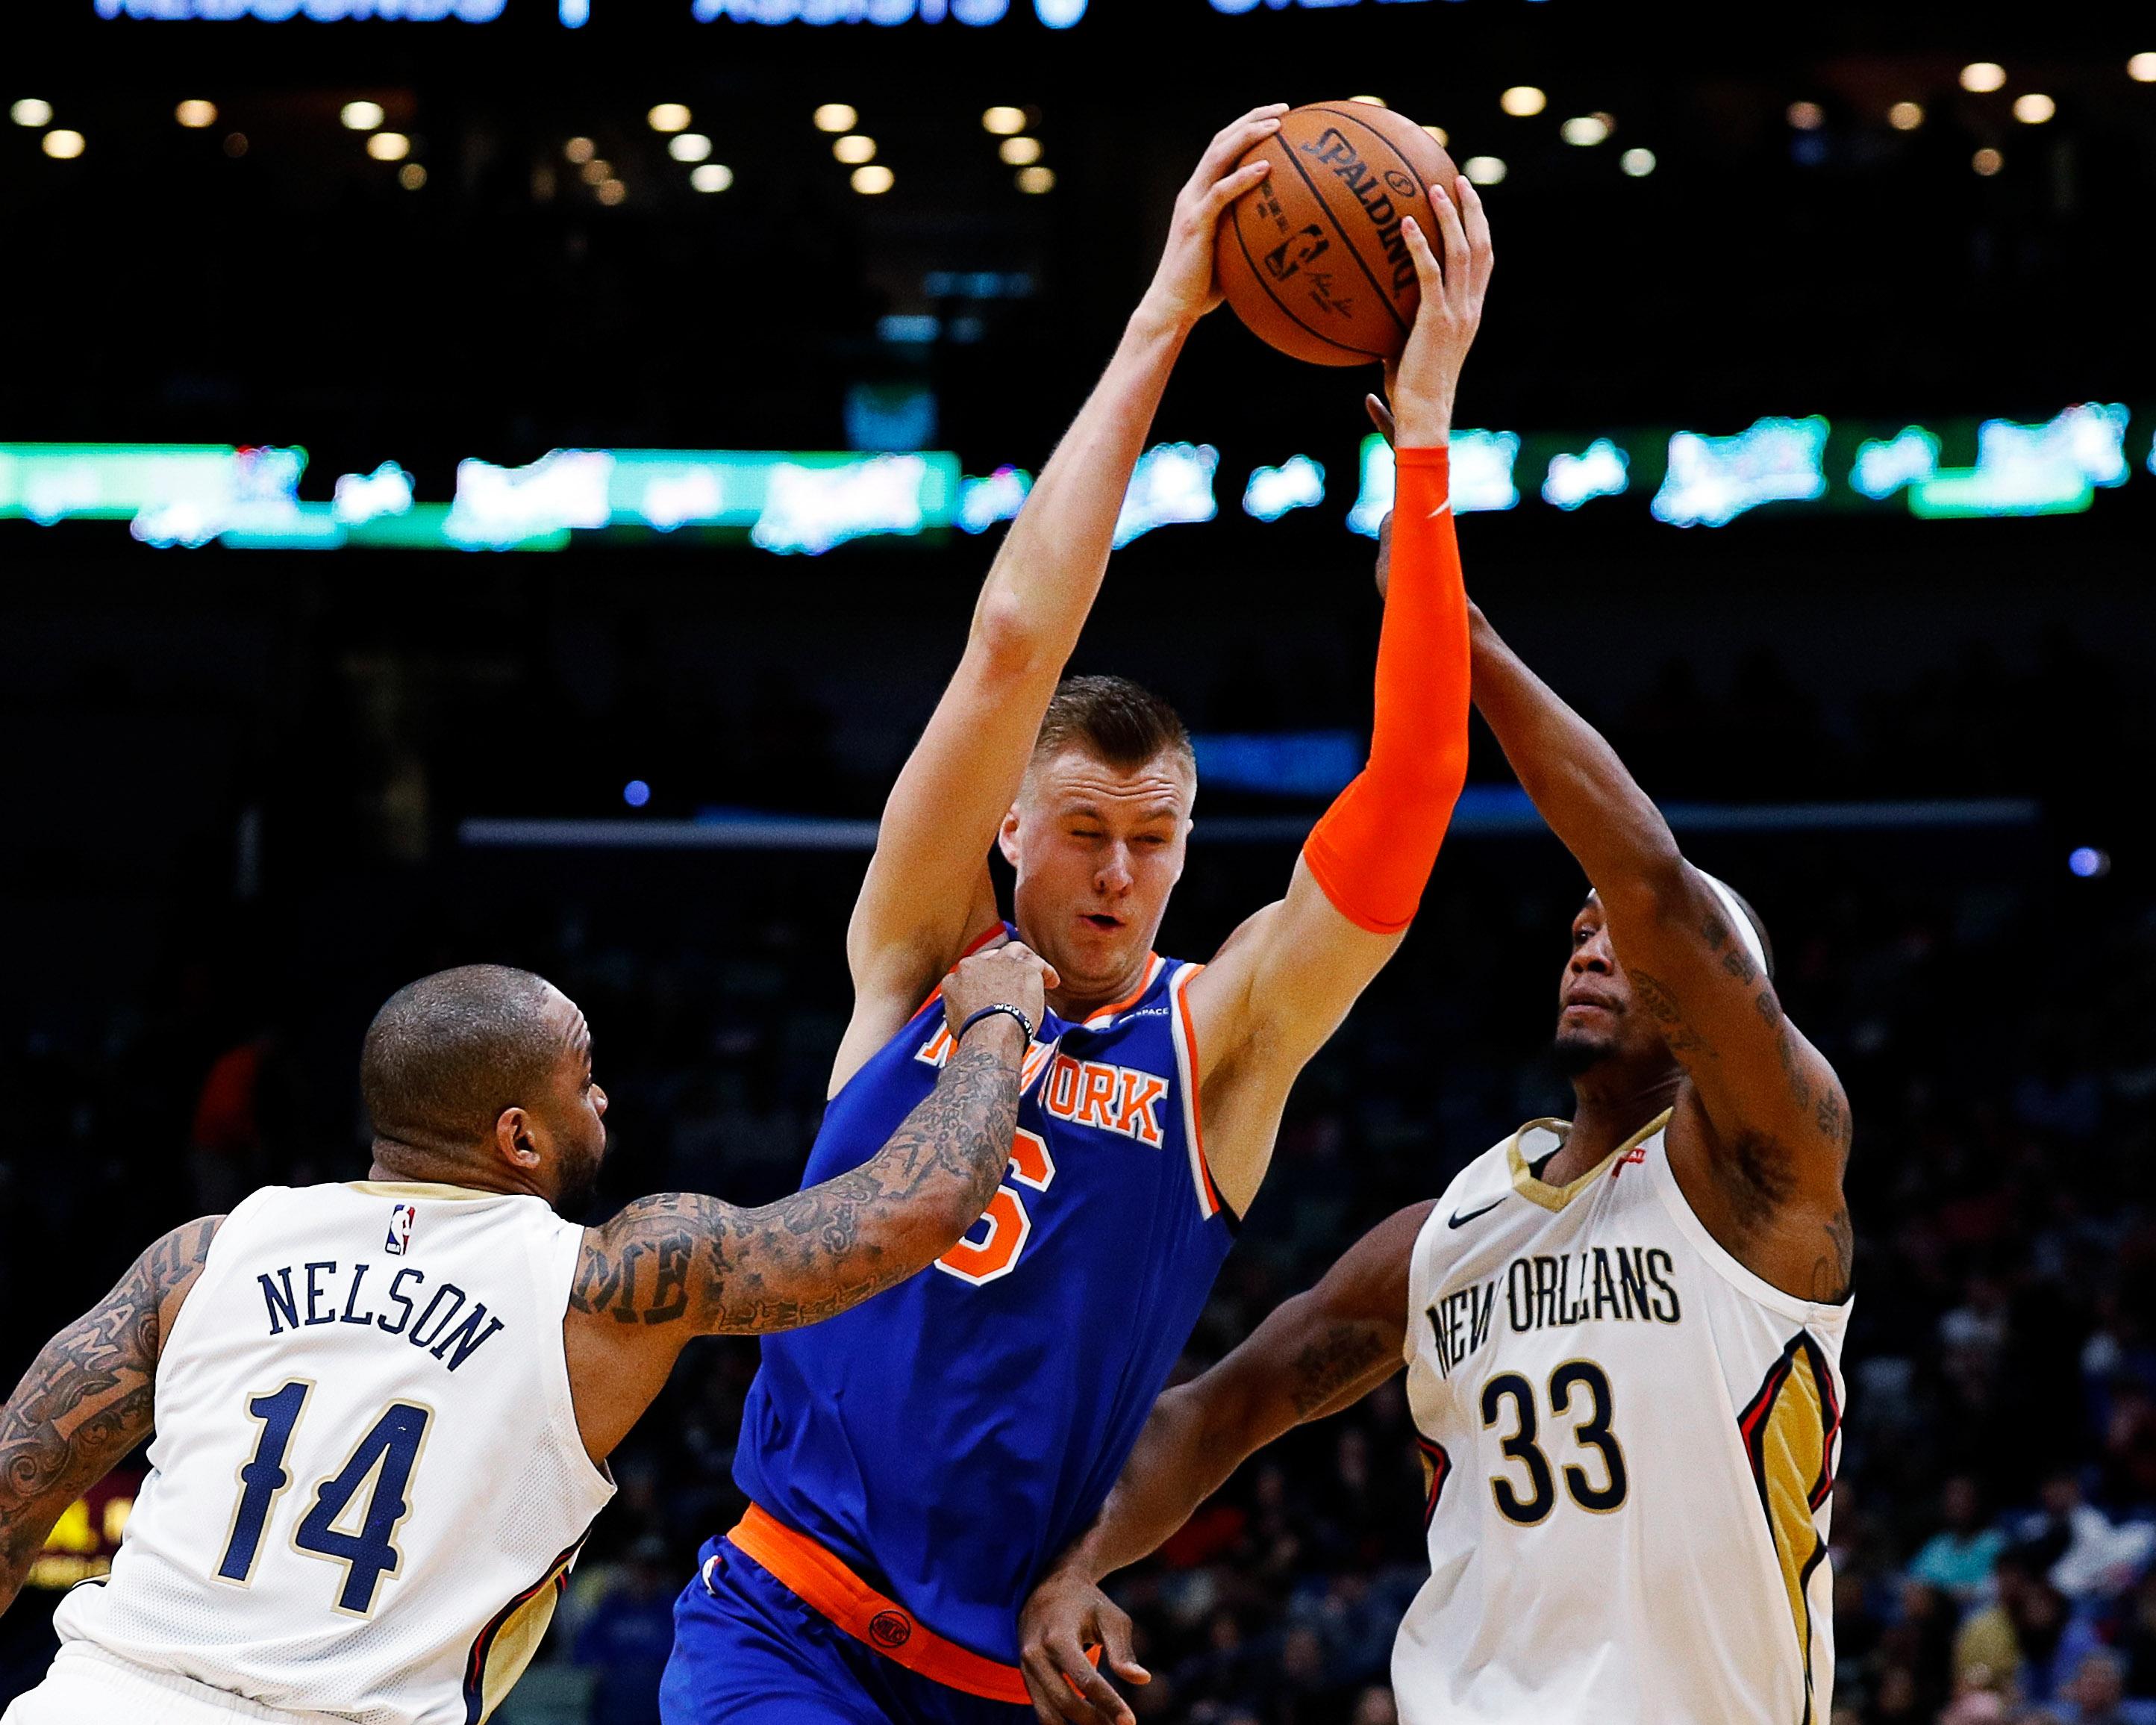 Kristaps Porzingis having difficulty adjusting to life as Knicks' star